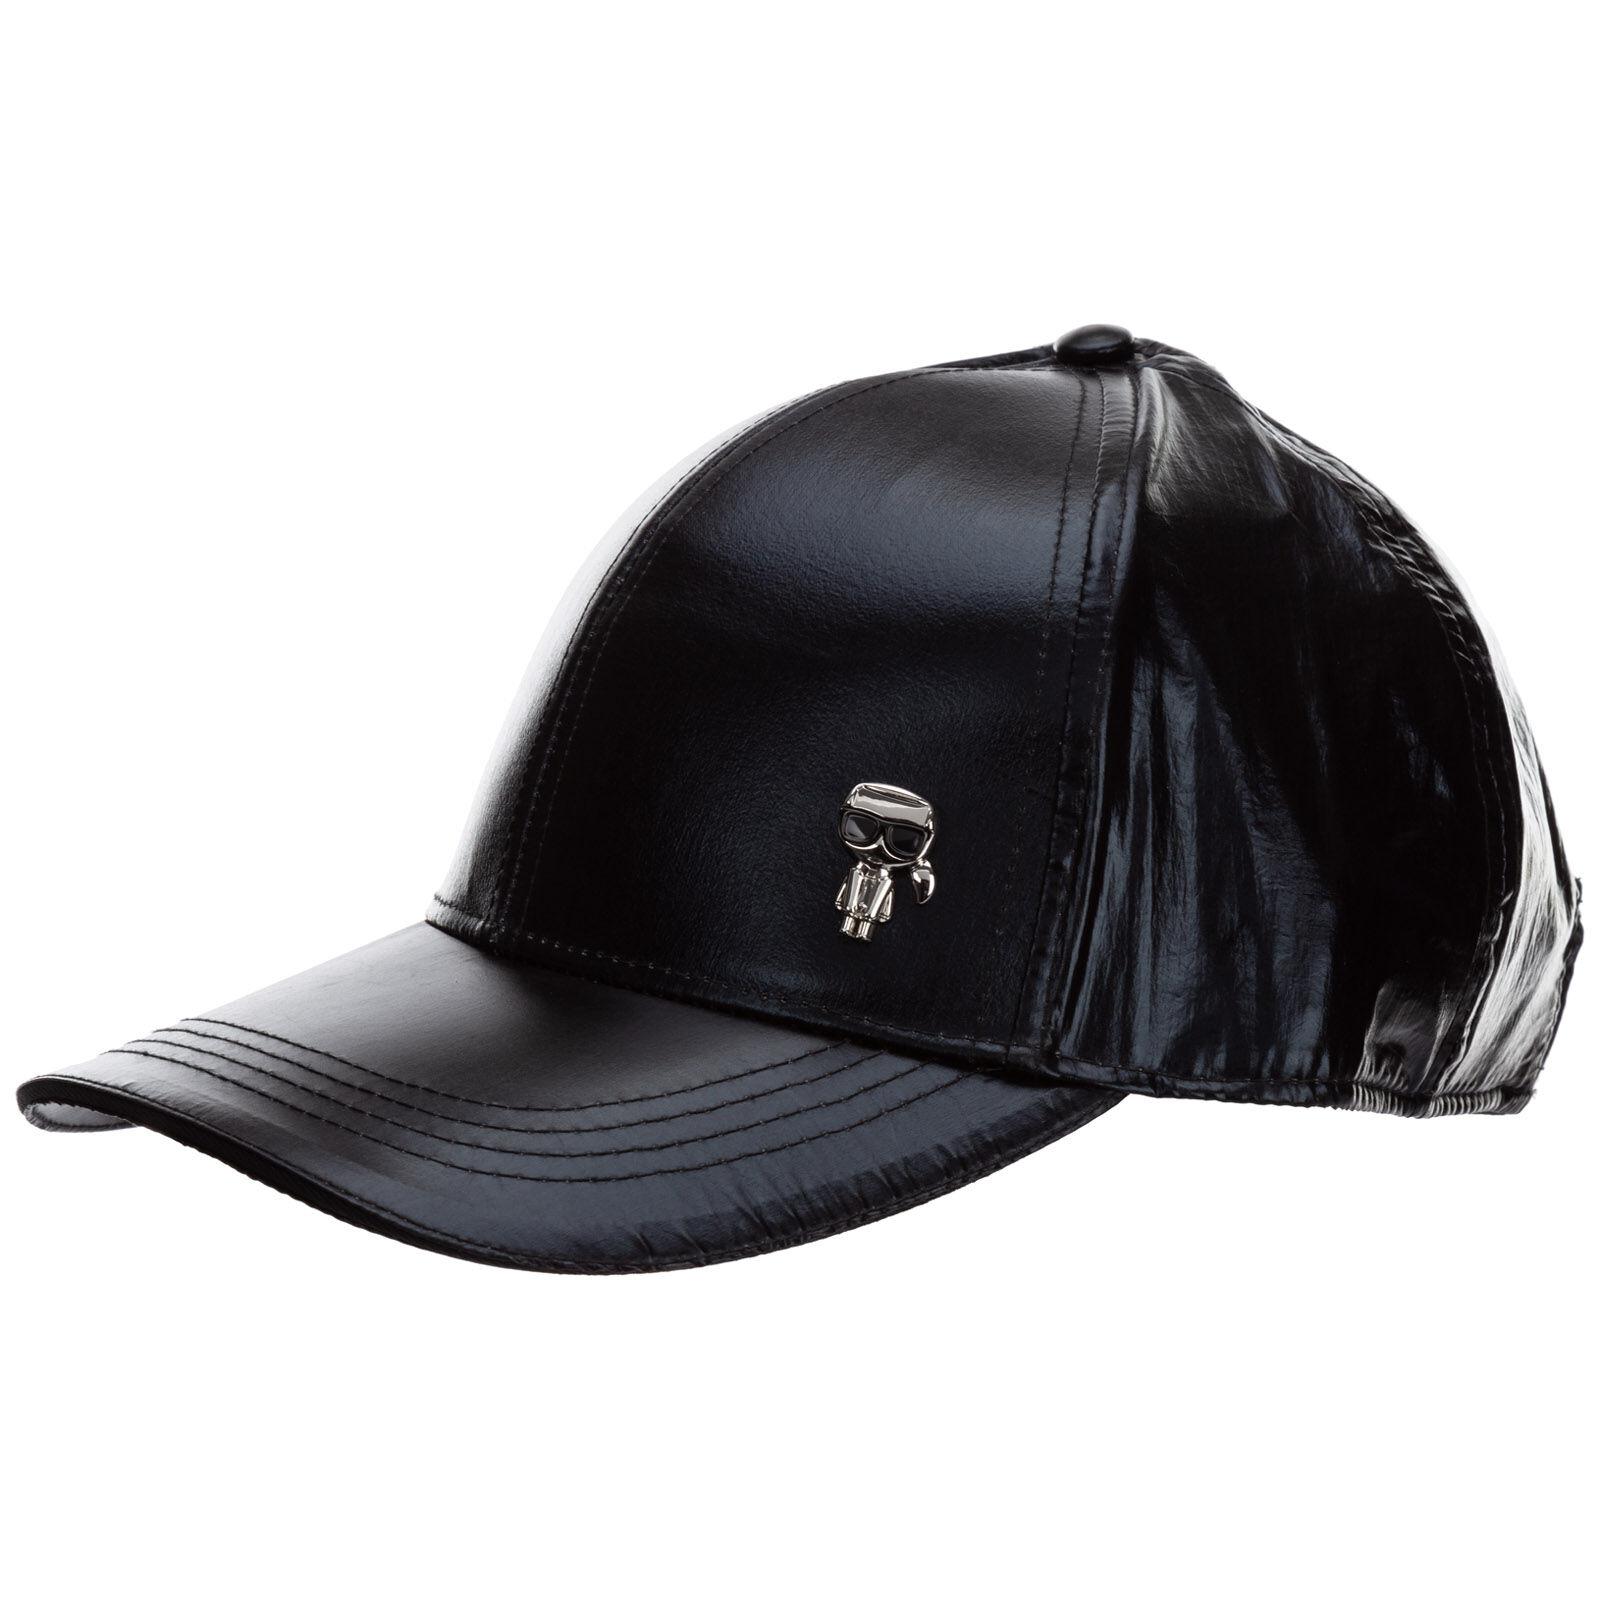 Karl Lagerfeld Adjustable women's hat baseball cap k/ikonik 3d  - Black